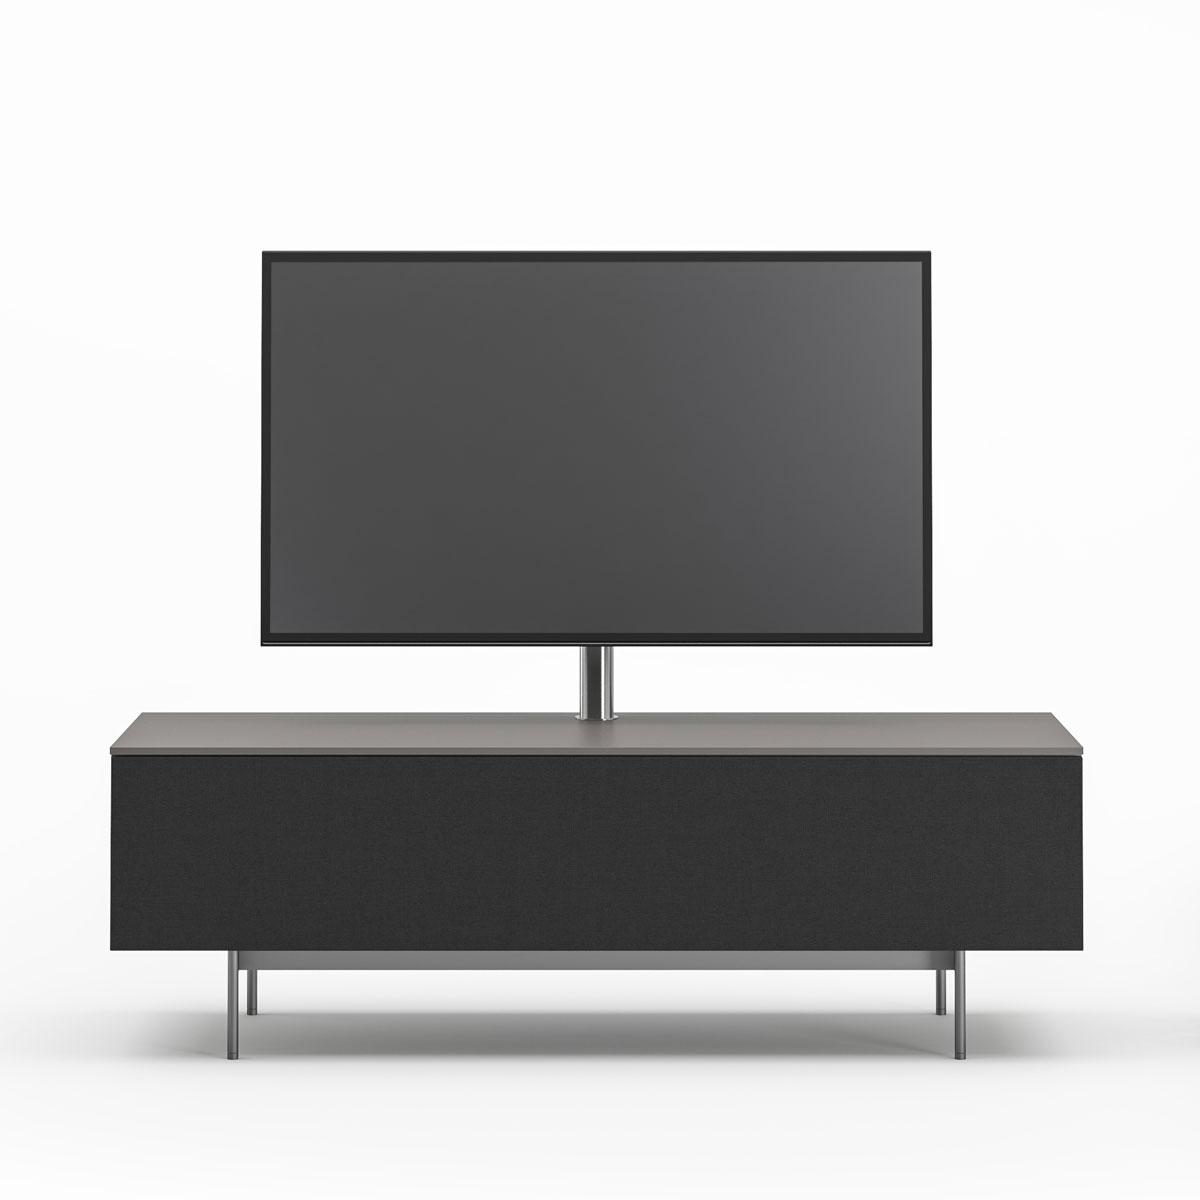 tv m bel fernsehm bel m bel f r lcd tv plasma m bel bei hifi tv seite 1. Black Bedroom Furniture Sets. Home Design Ideas